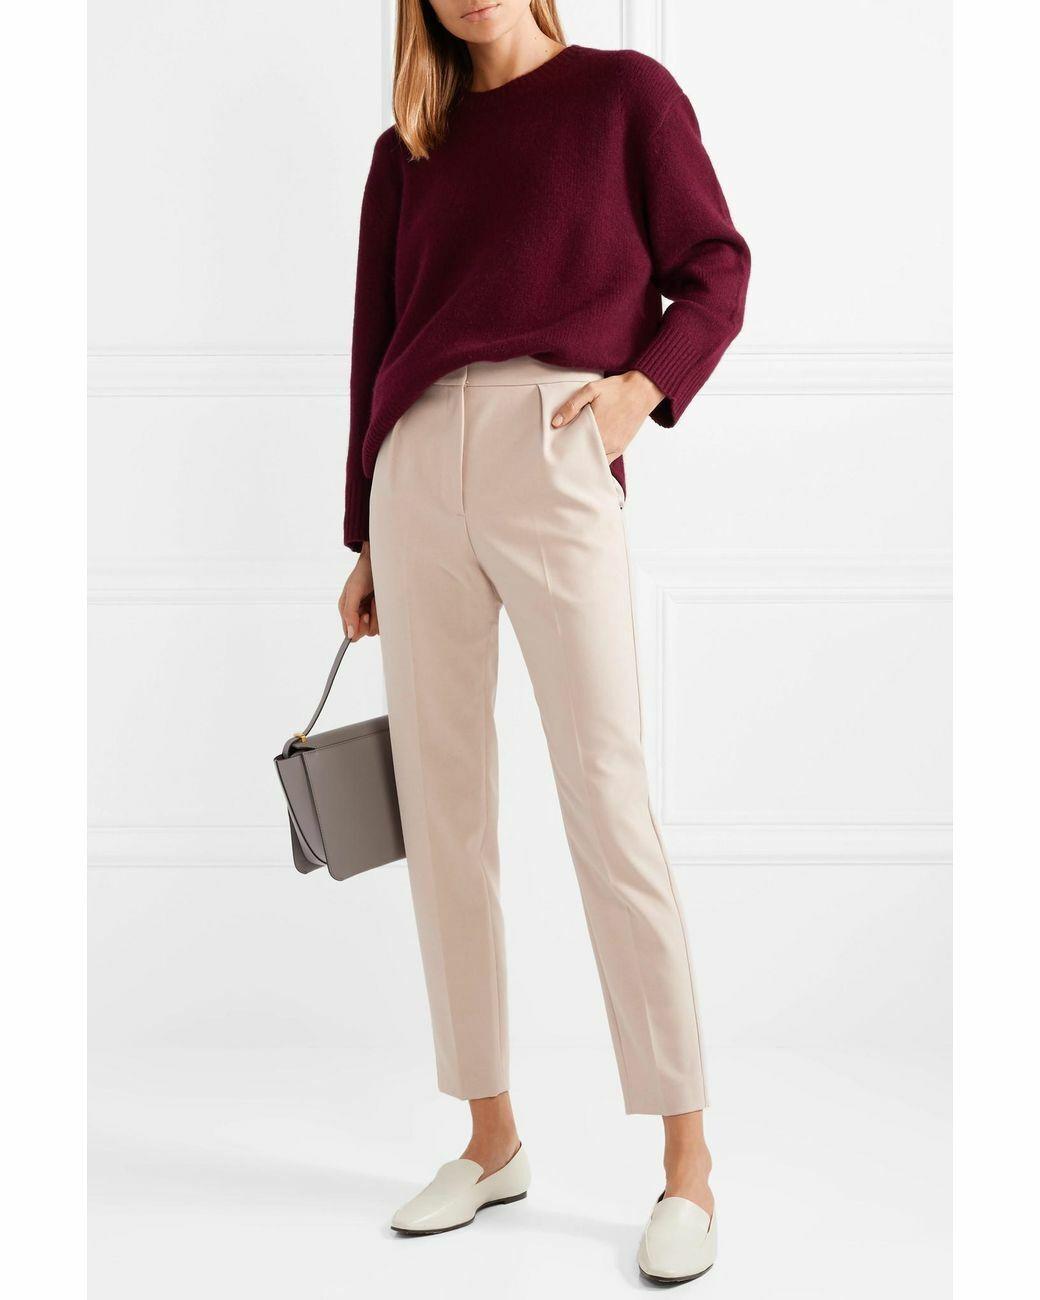 Theory Women's Pants Size 4 City Pant Petal Pink Prospective Light Stretch Twill